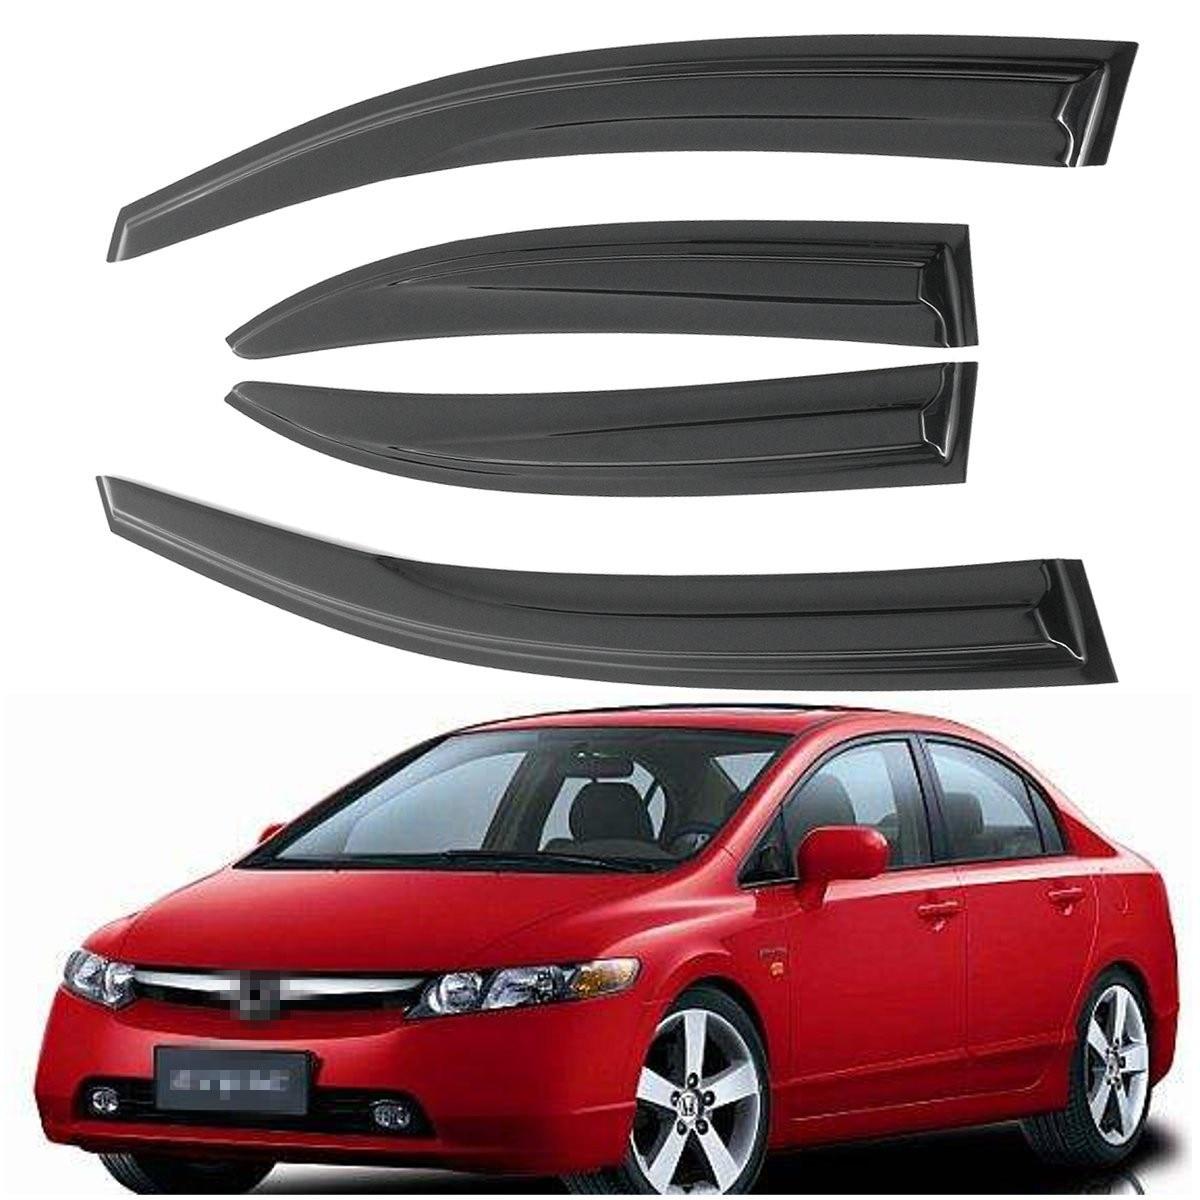 Smoke Tinted Side Rain Guard Sun Shade Window Visors For Honda -Civic 06-11